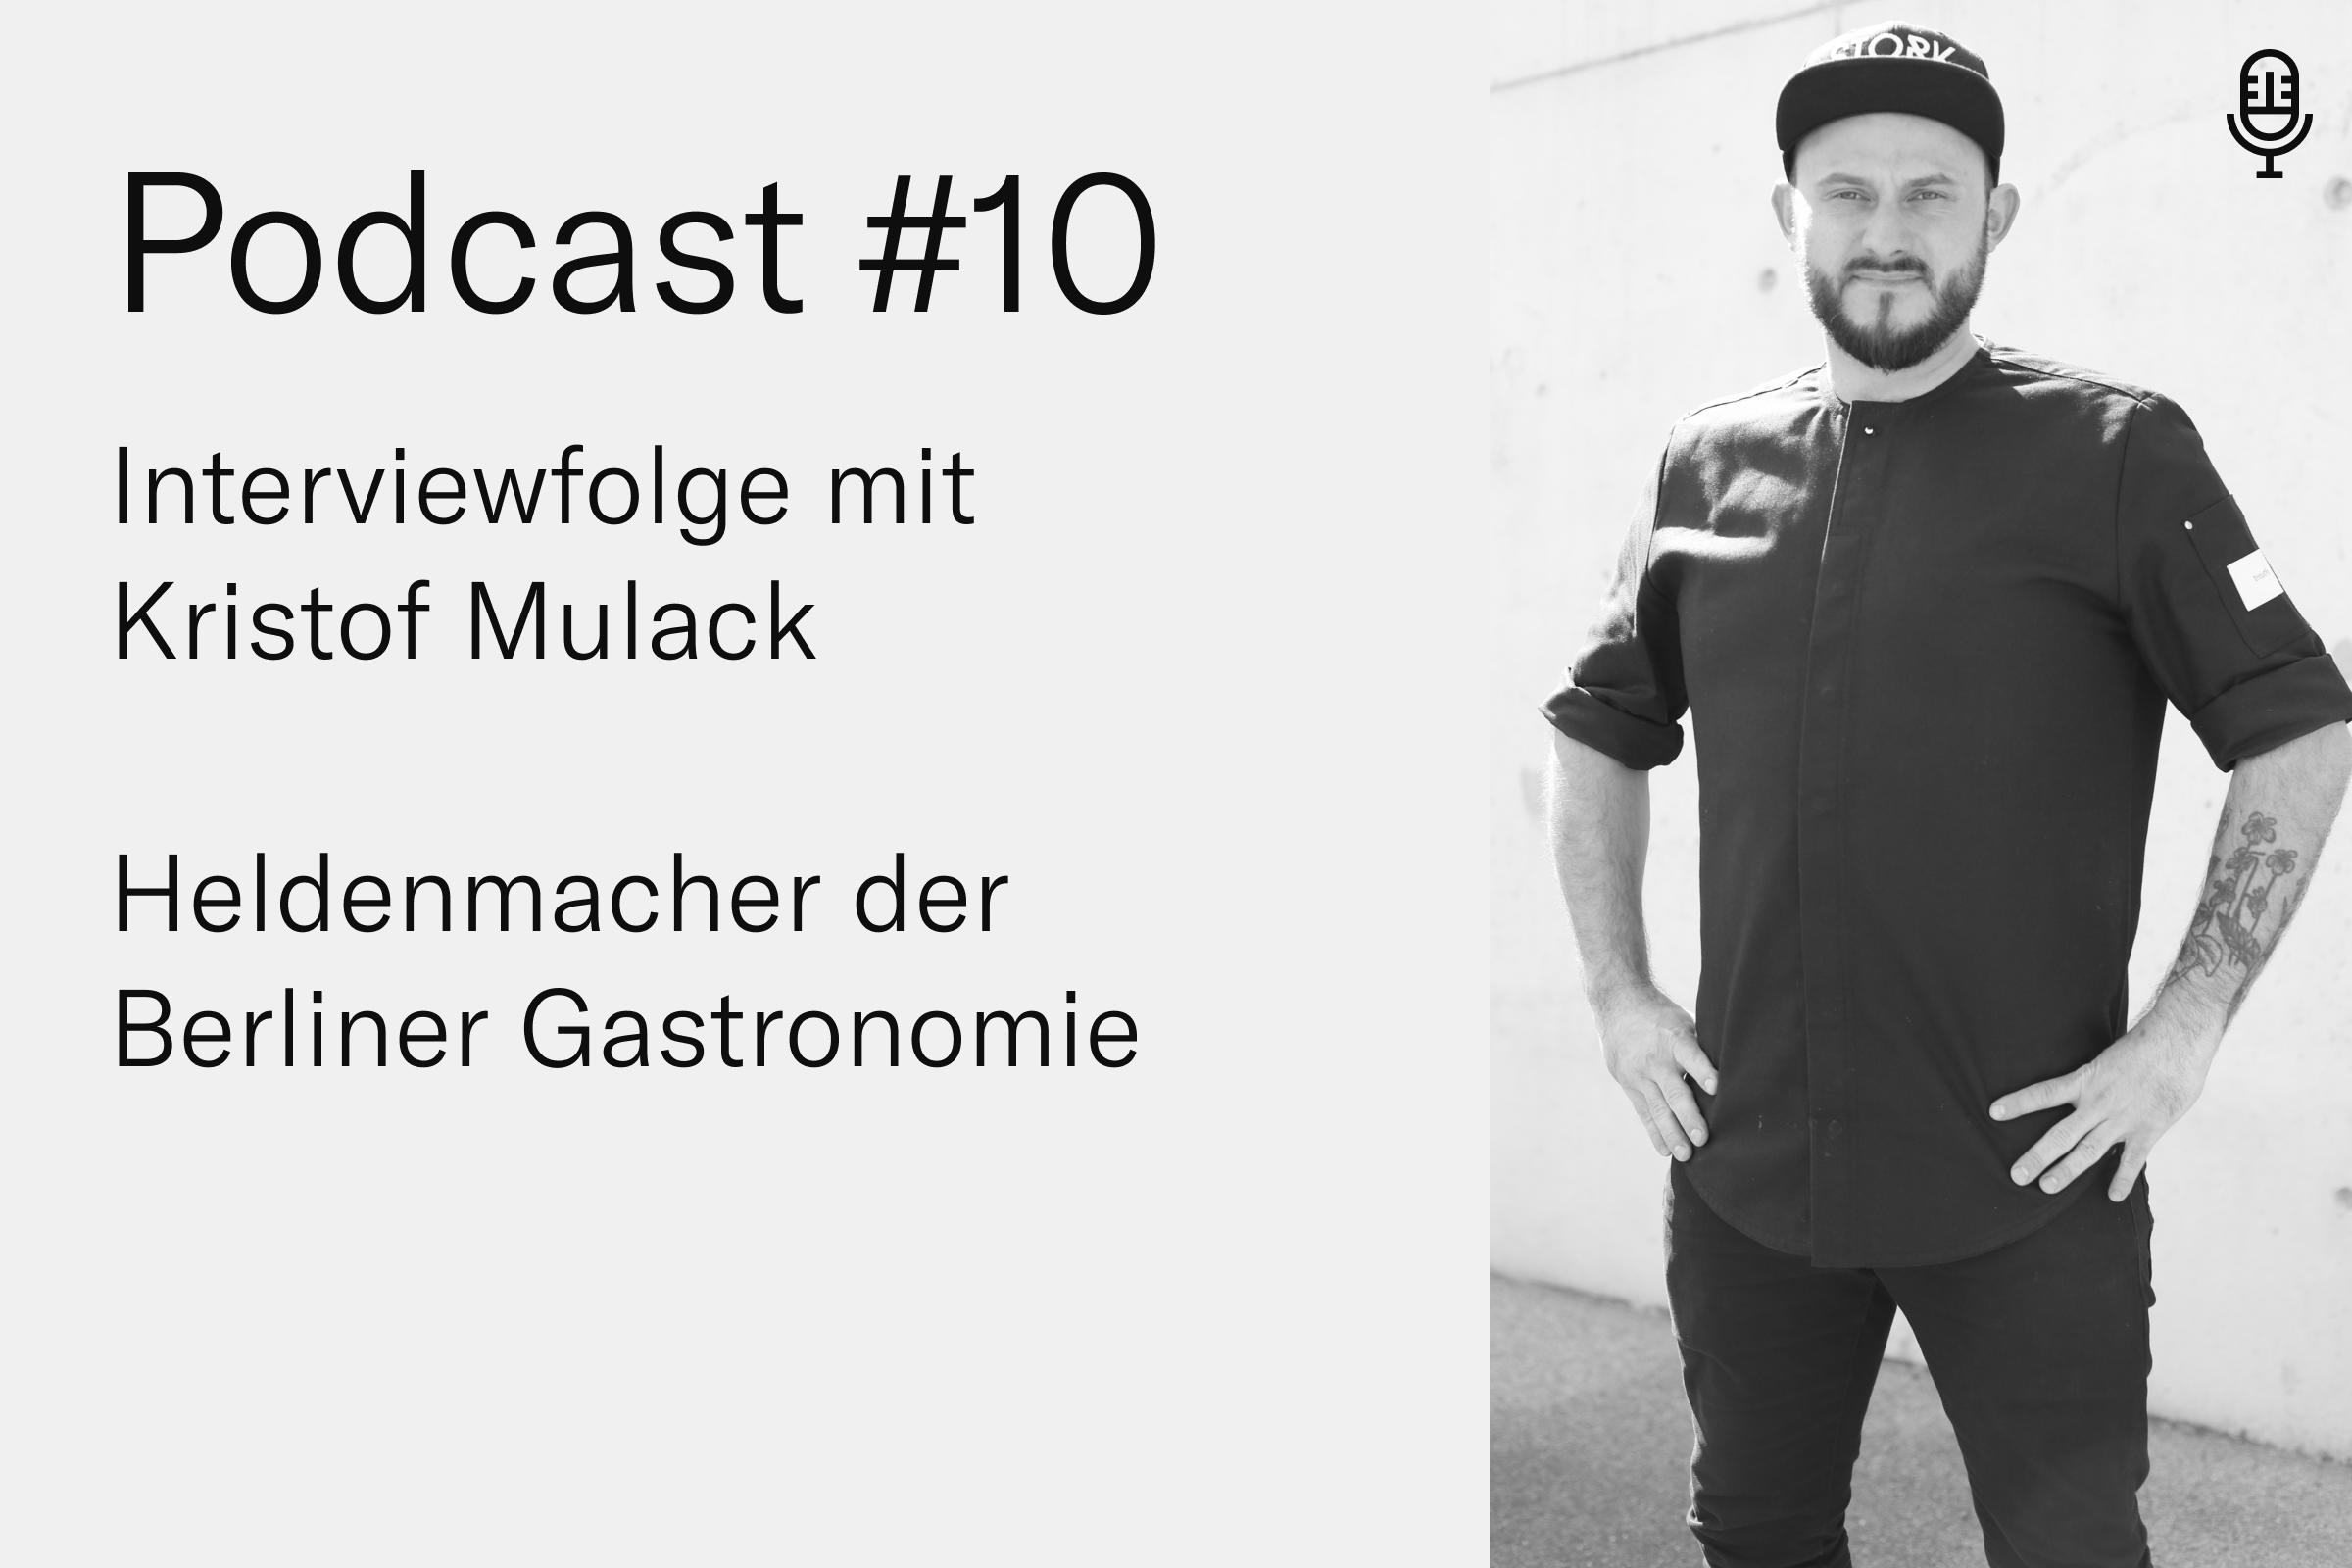 #10 Interviewfolge mit Kristof Mulack